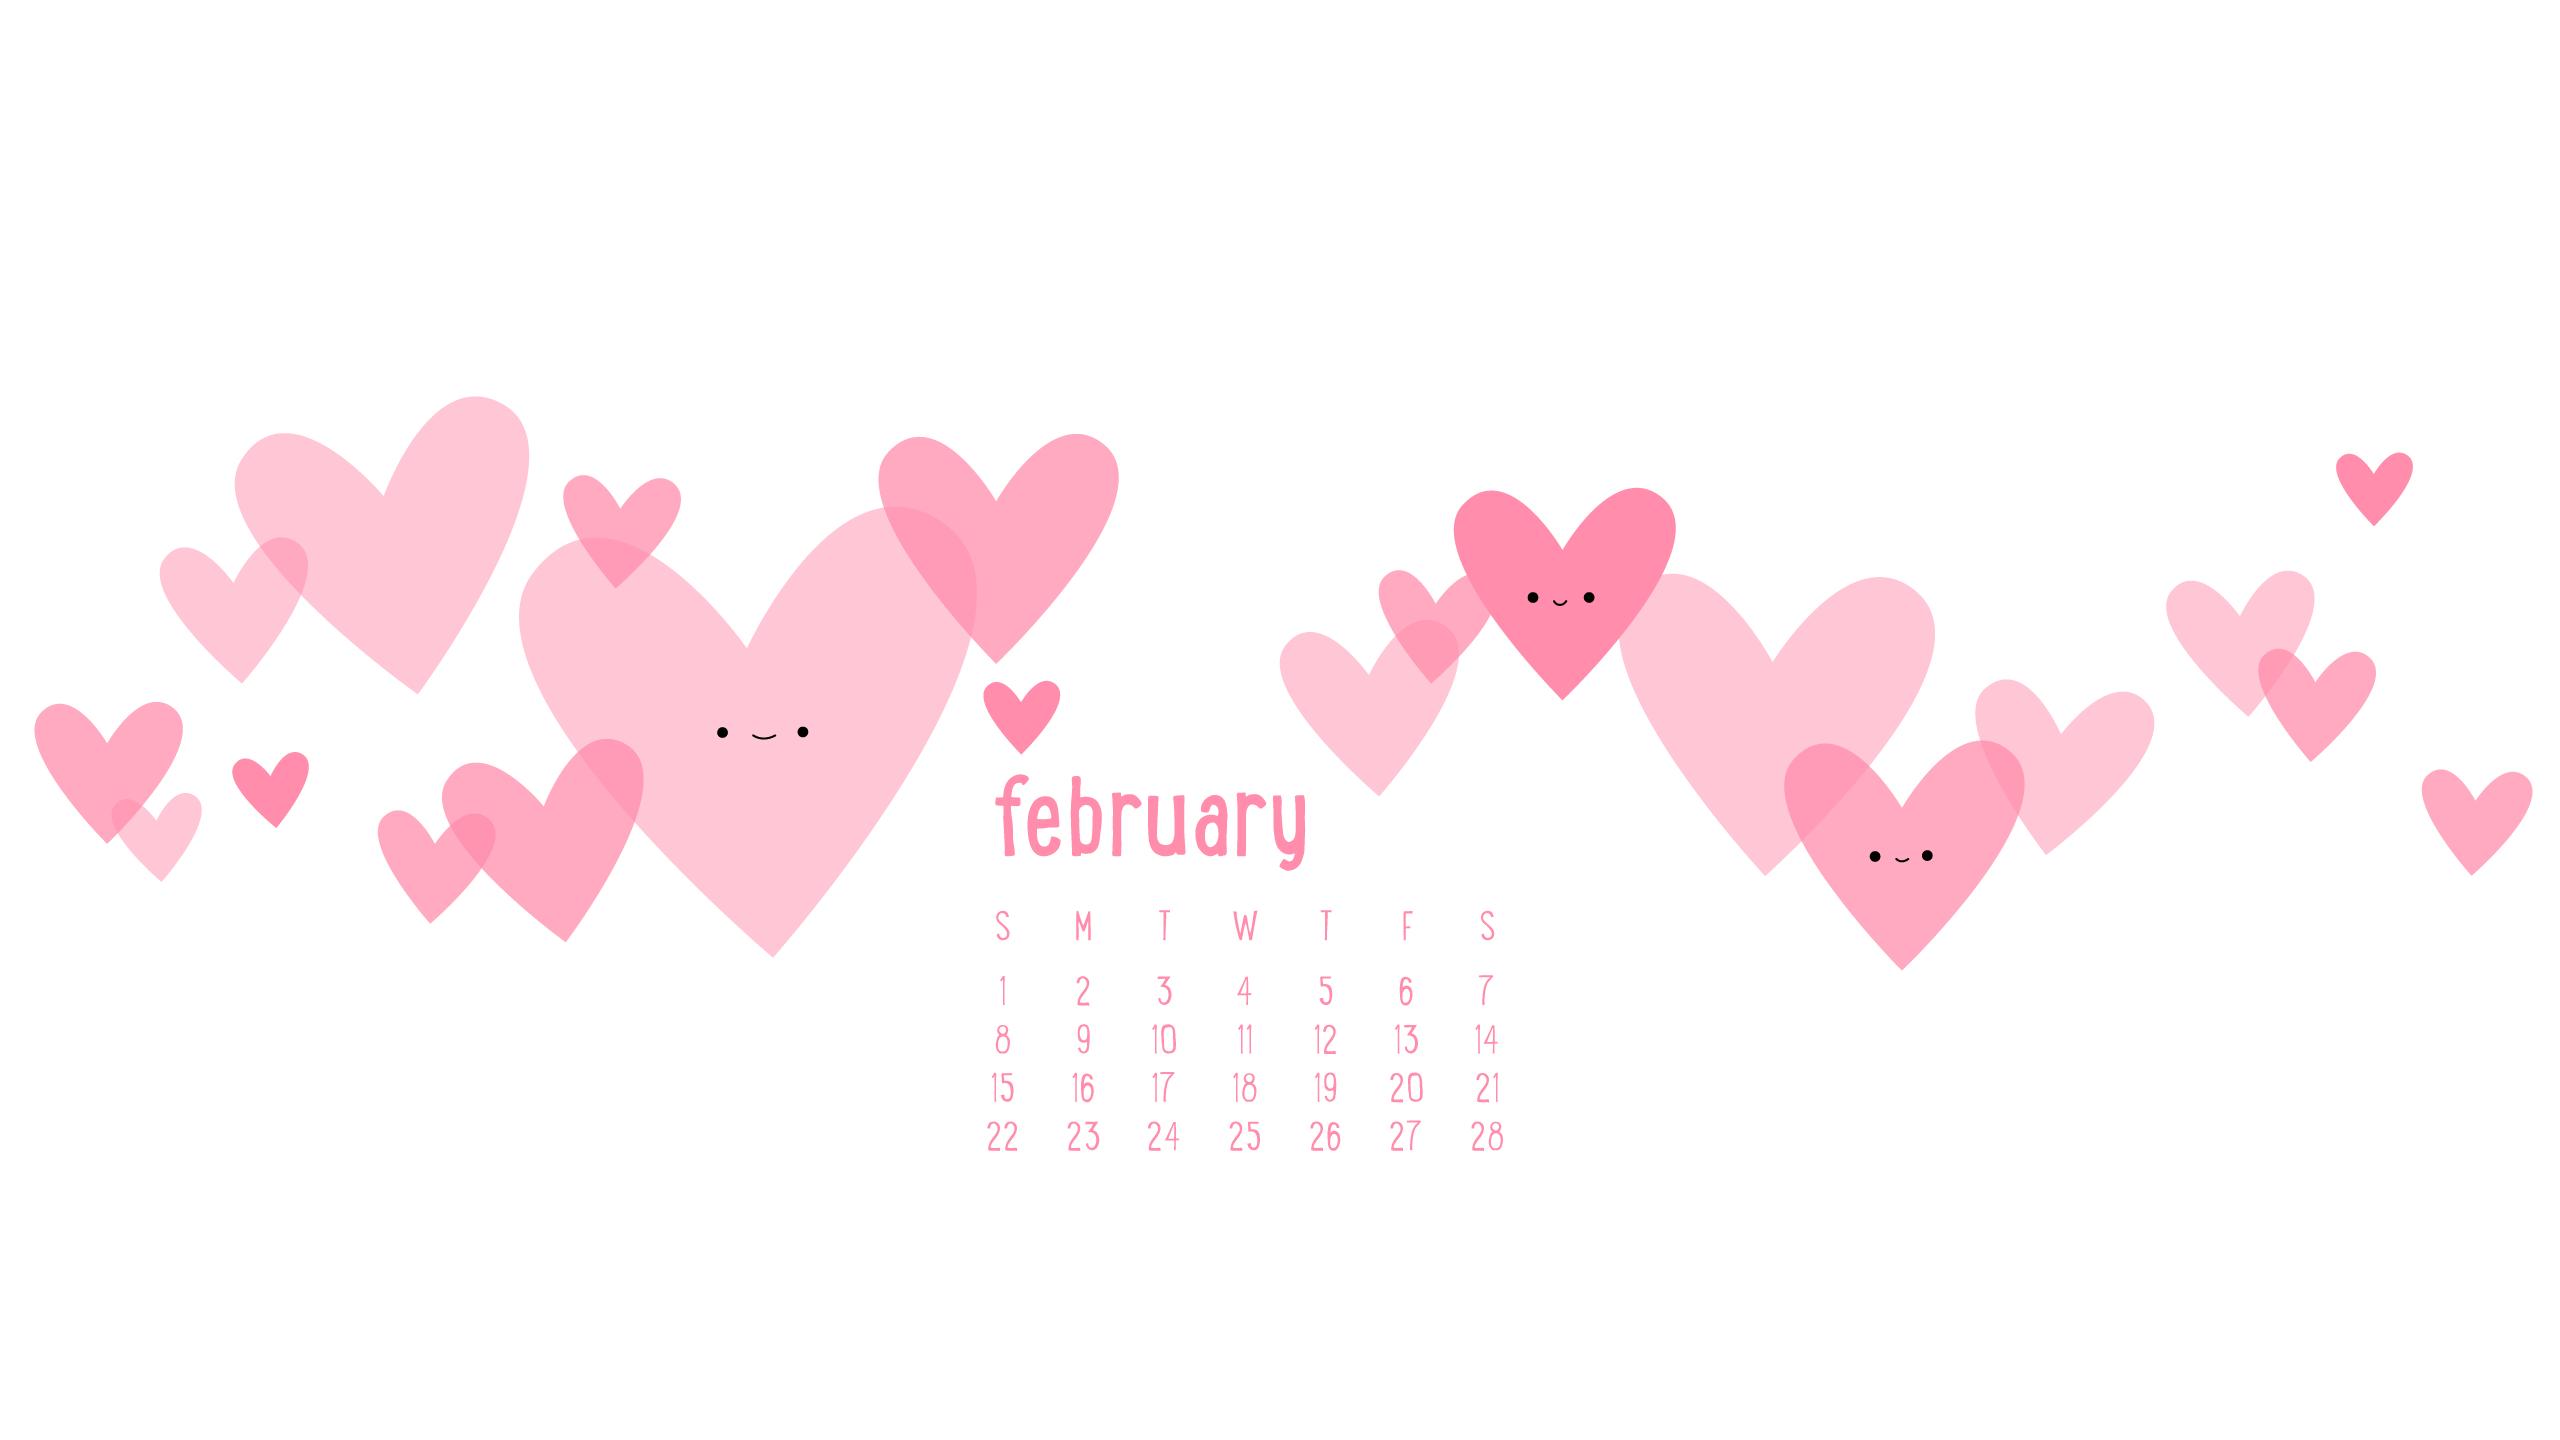 February clipart wallpaper. Wallpapers calendar cave